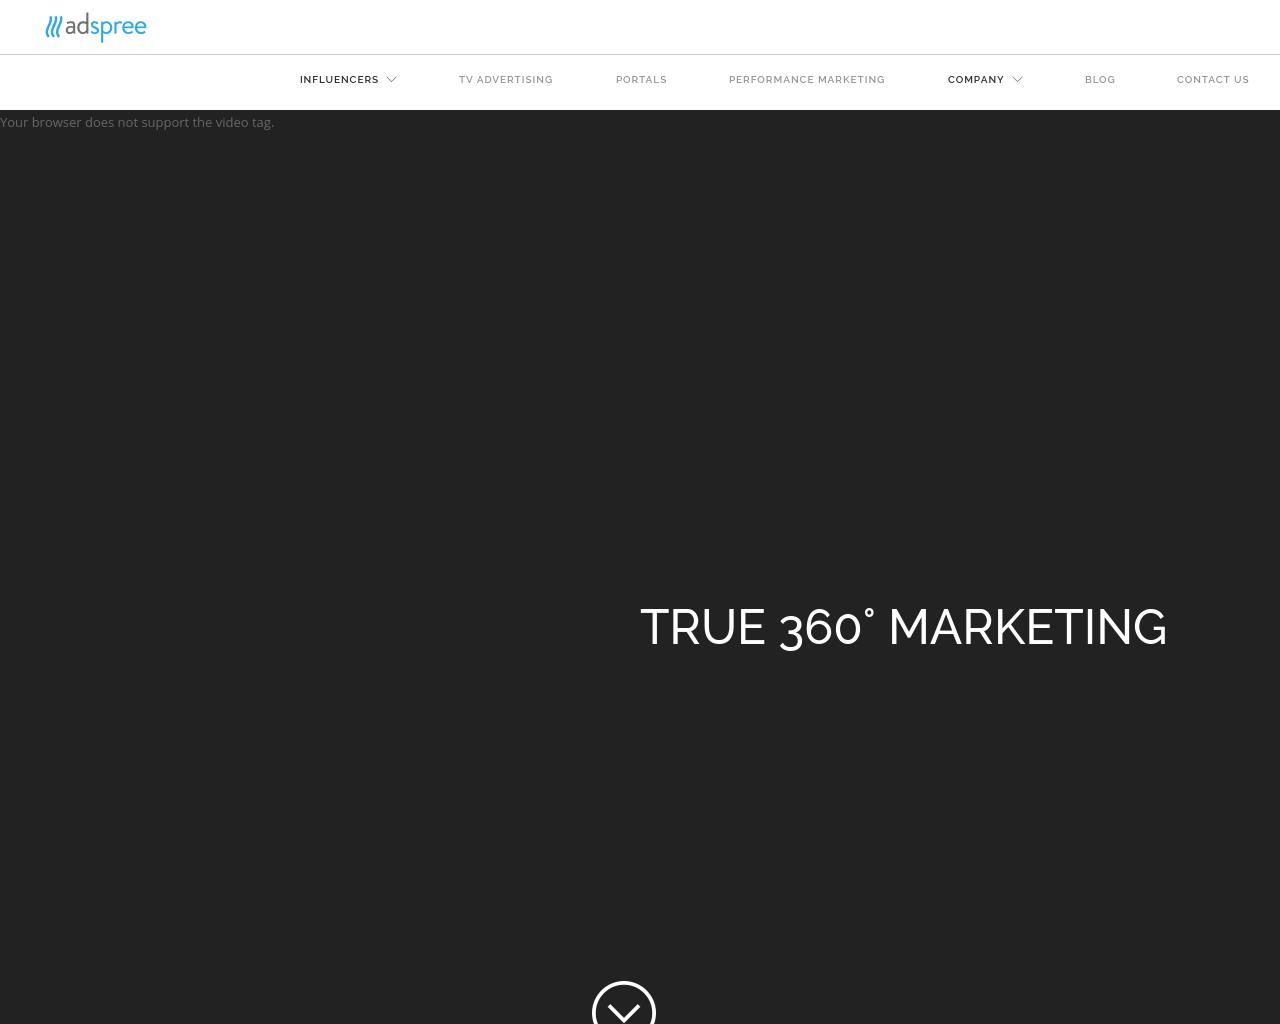 AdSpree-Advertising-Reviews-Pricing